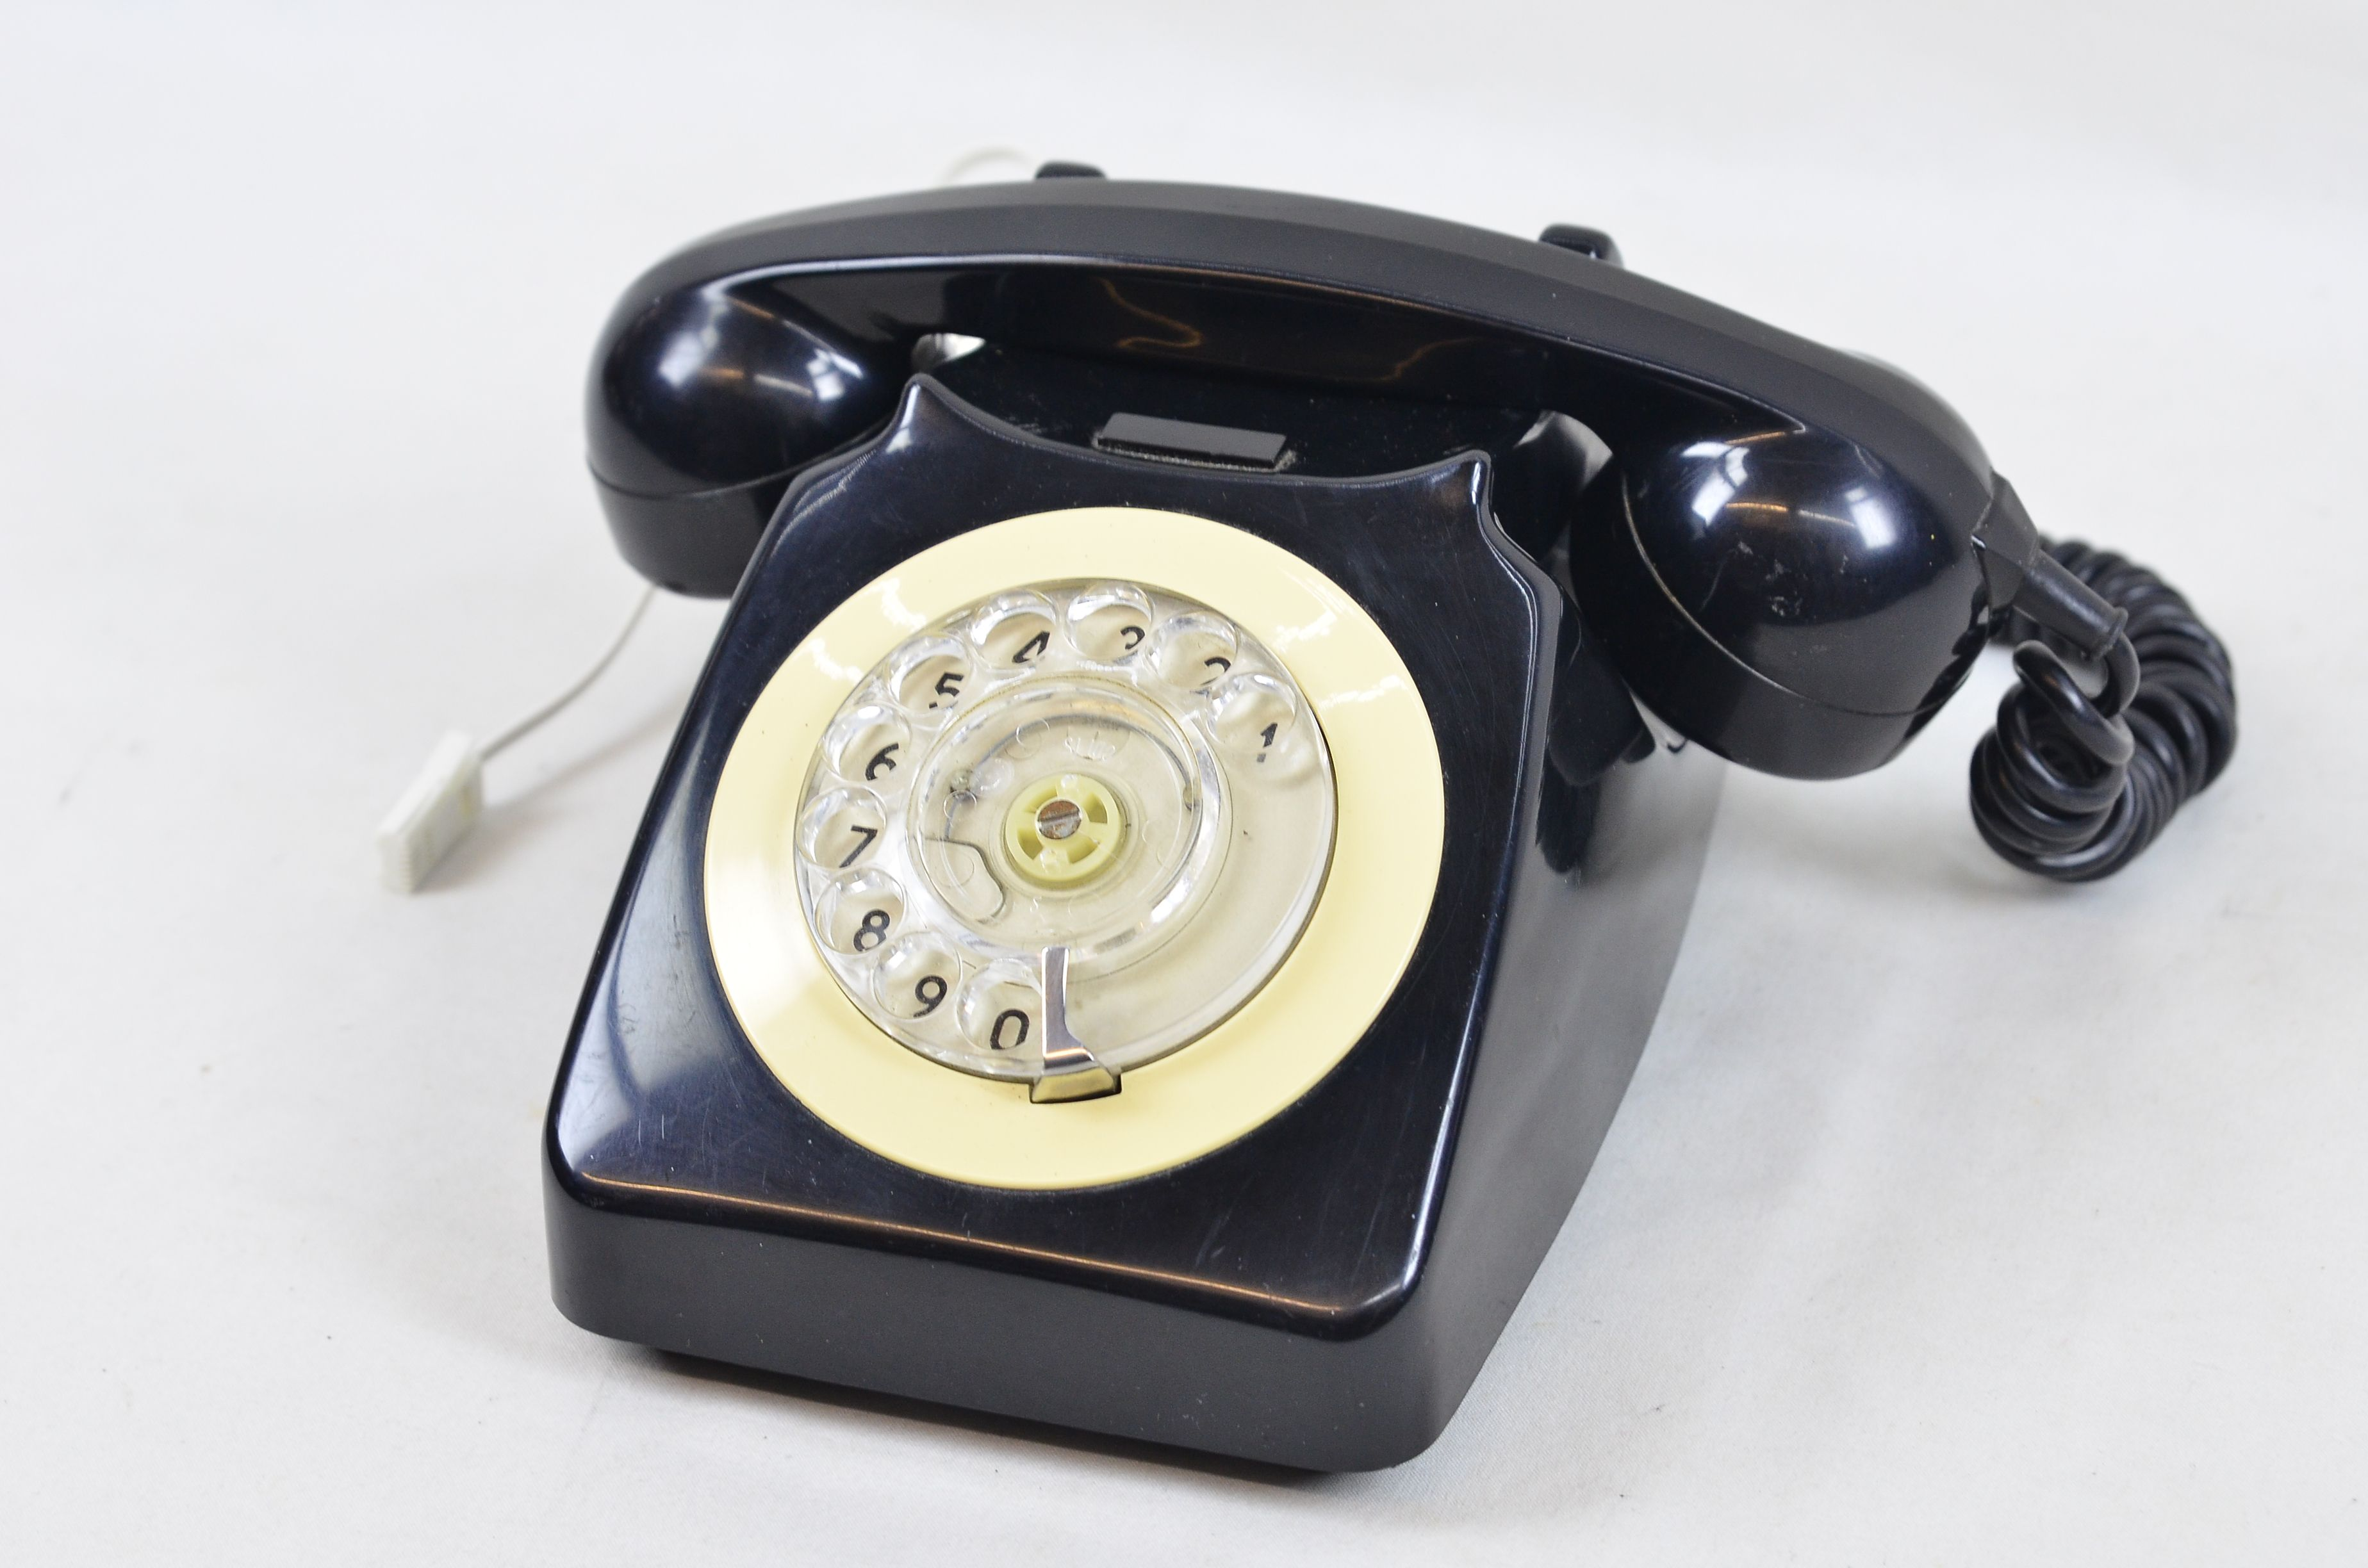 Vintage GPO BT 746F Rotary Telephone Black Cream